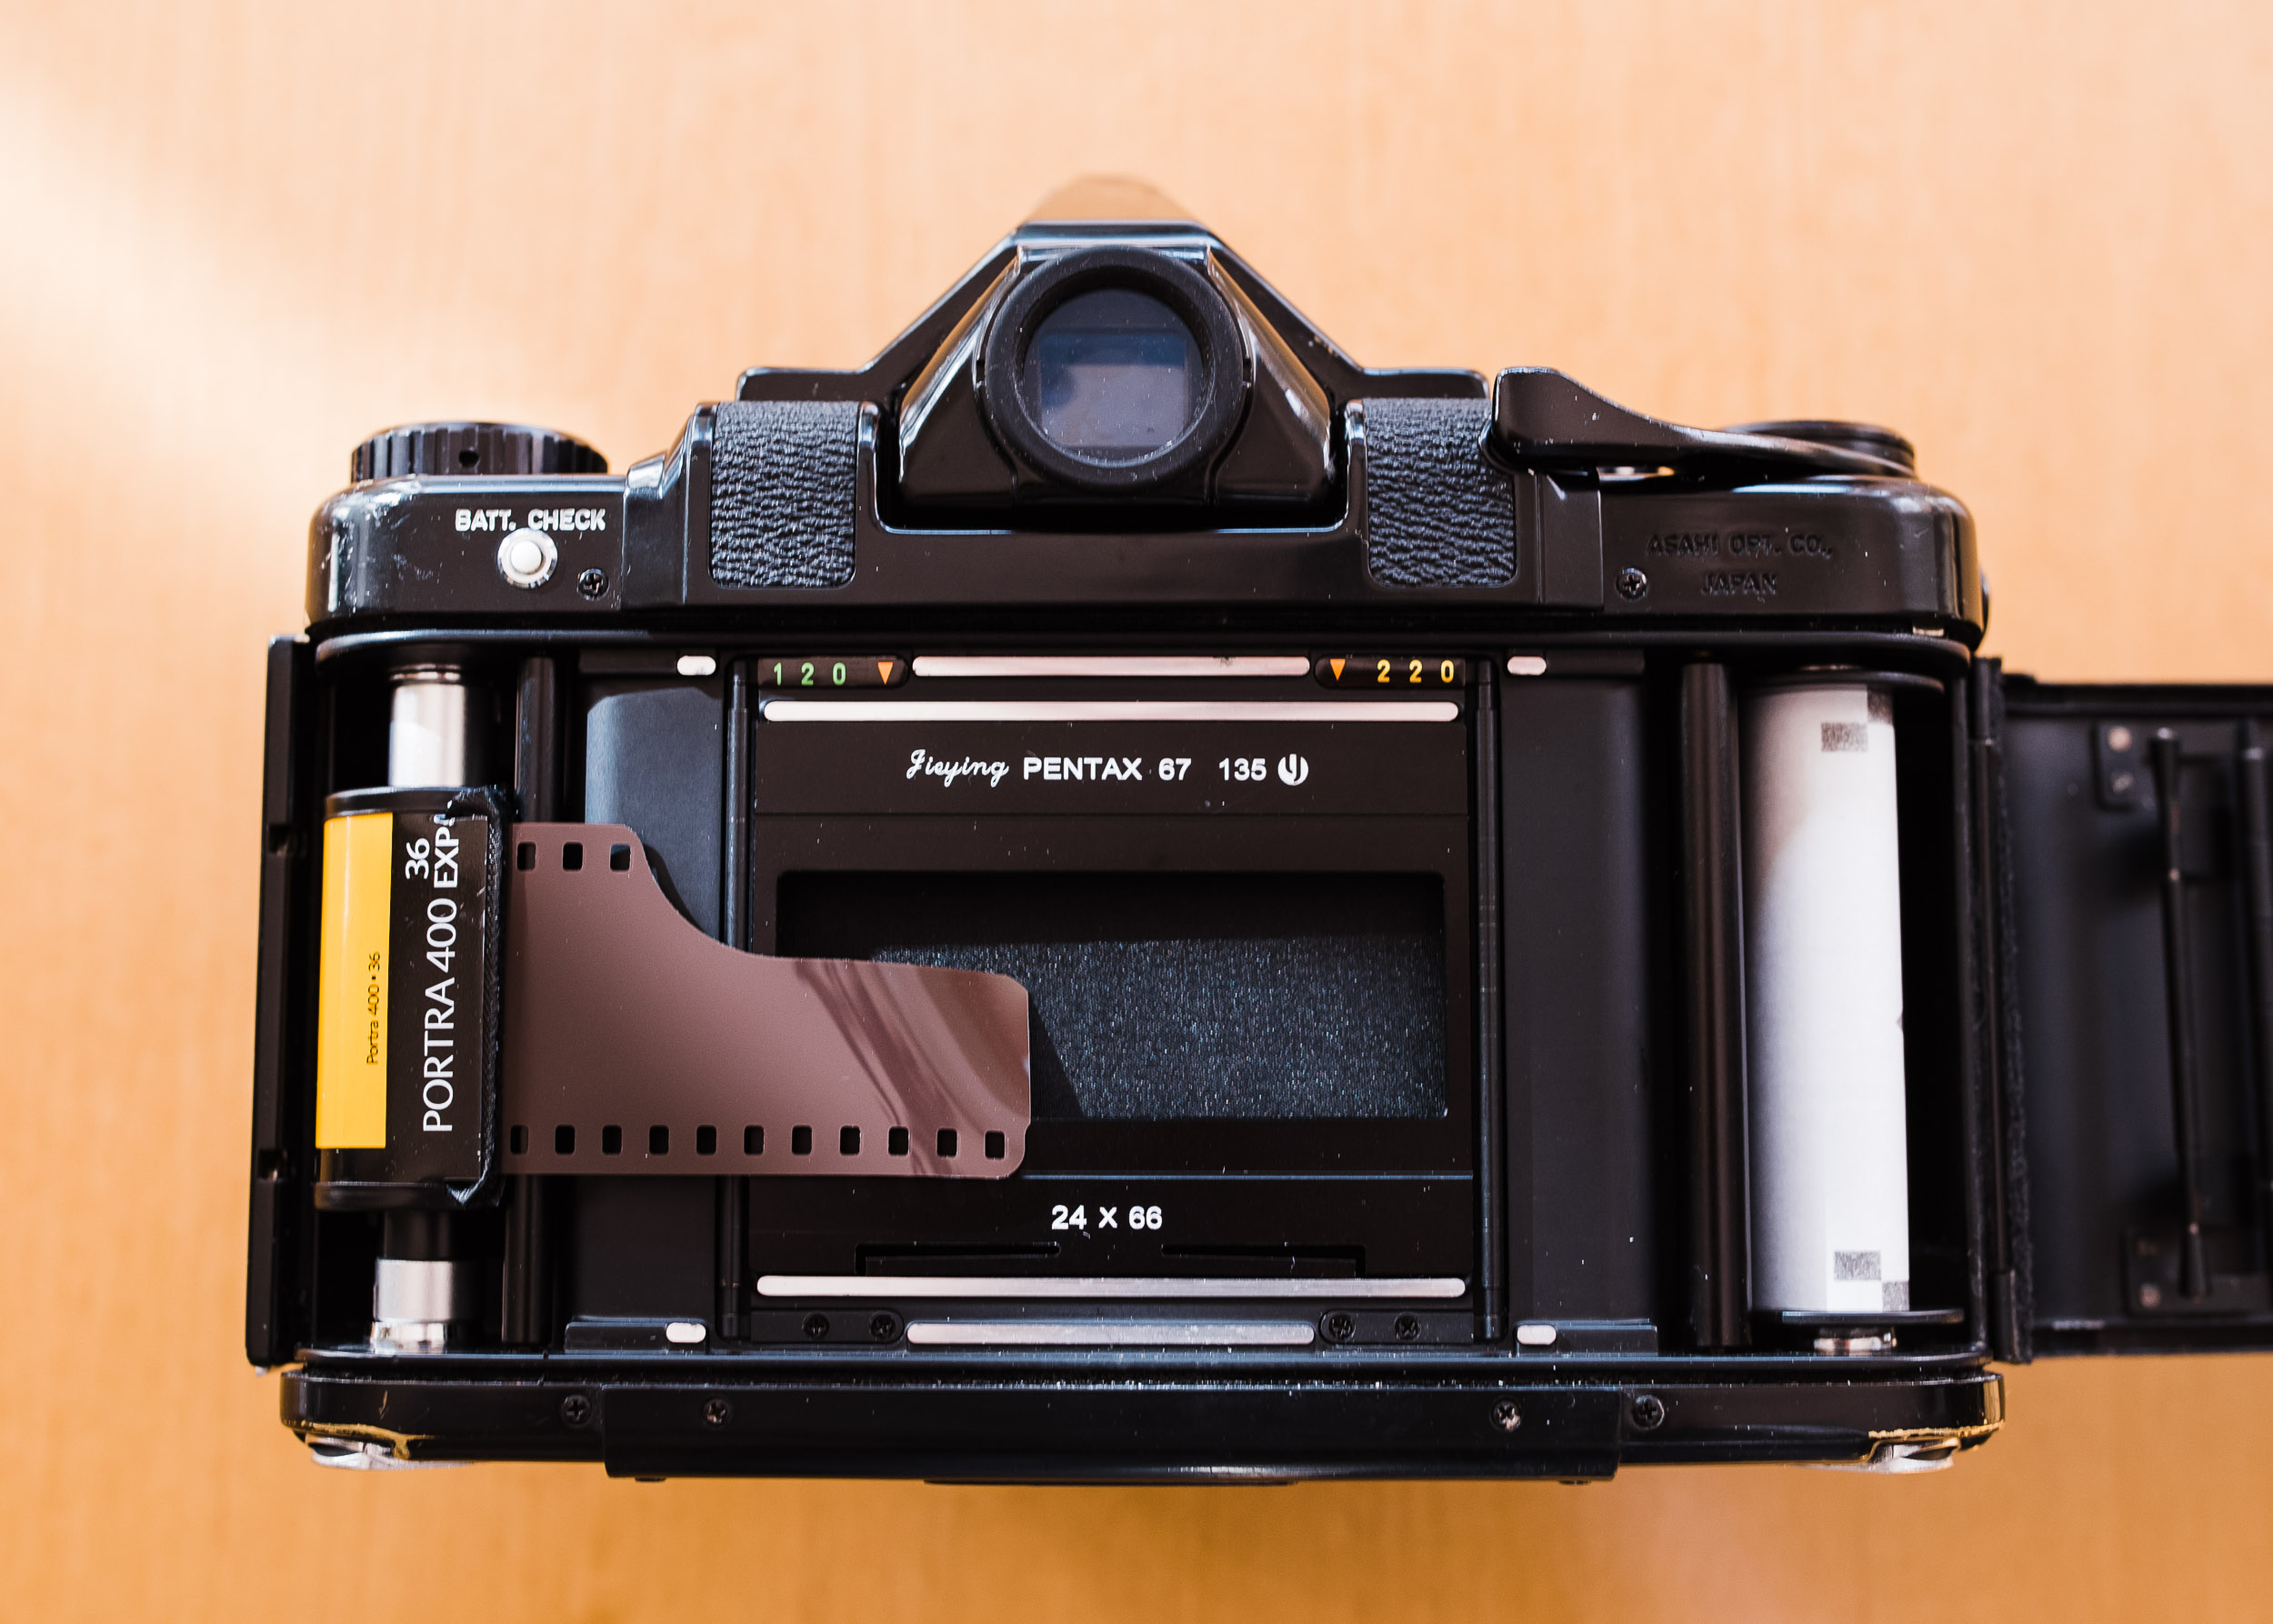 Pentax 67 35mm panorama step 1